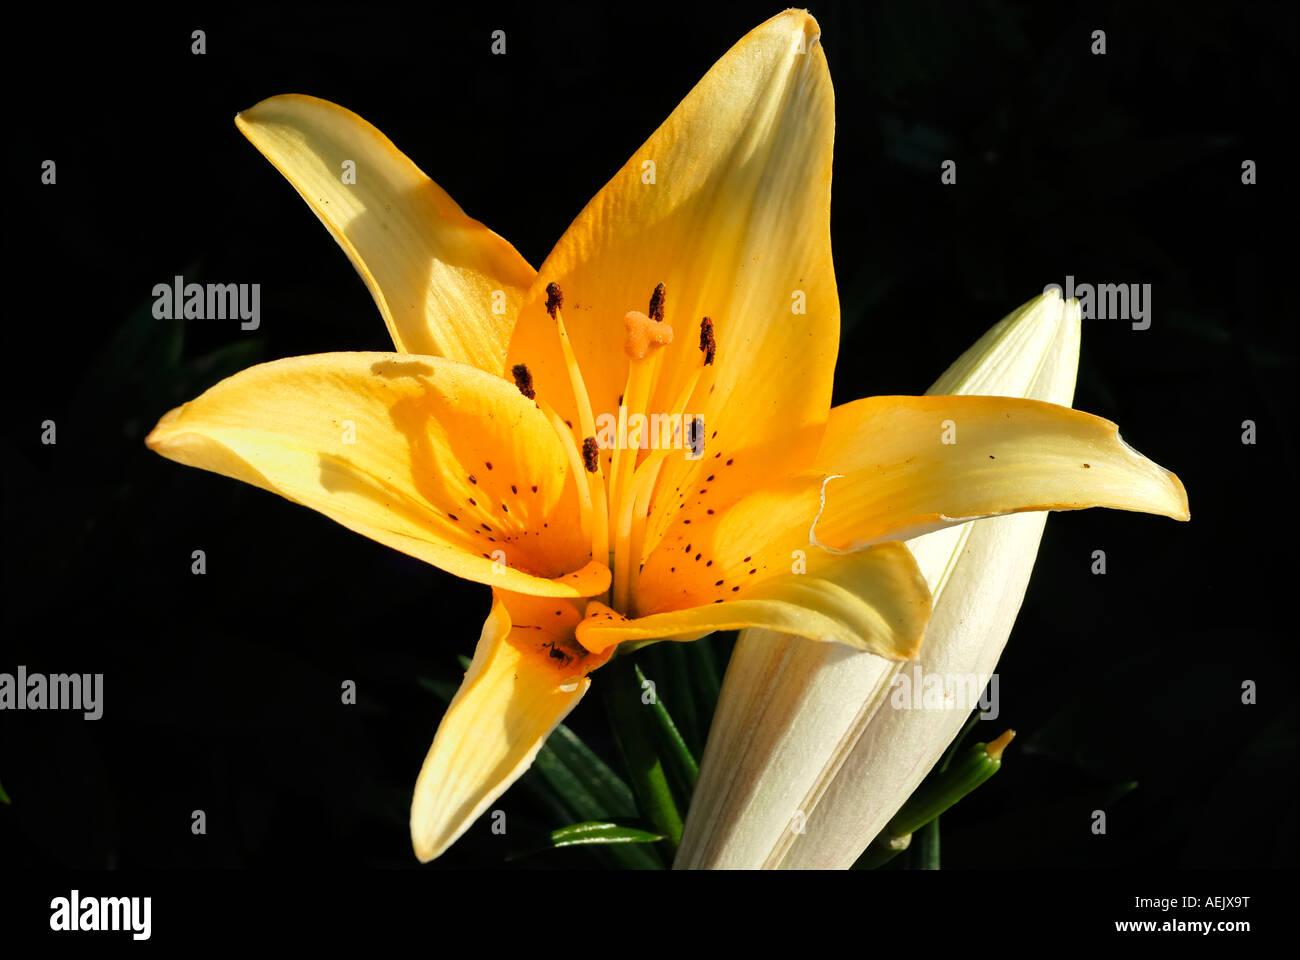 Lily flower, lilia hybride Stock Photo